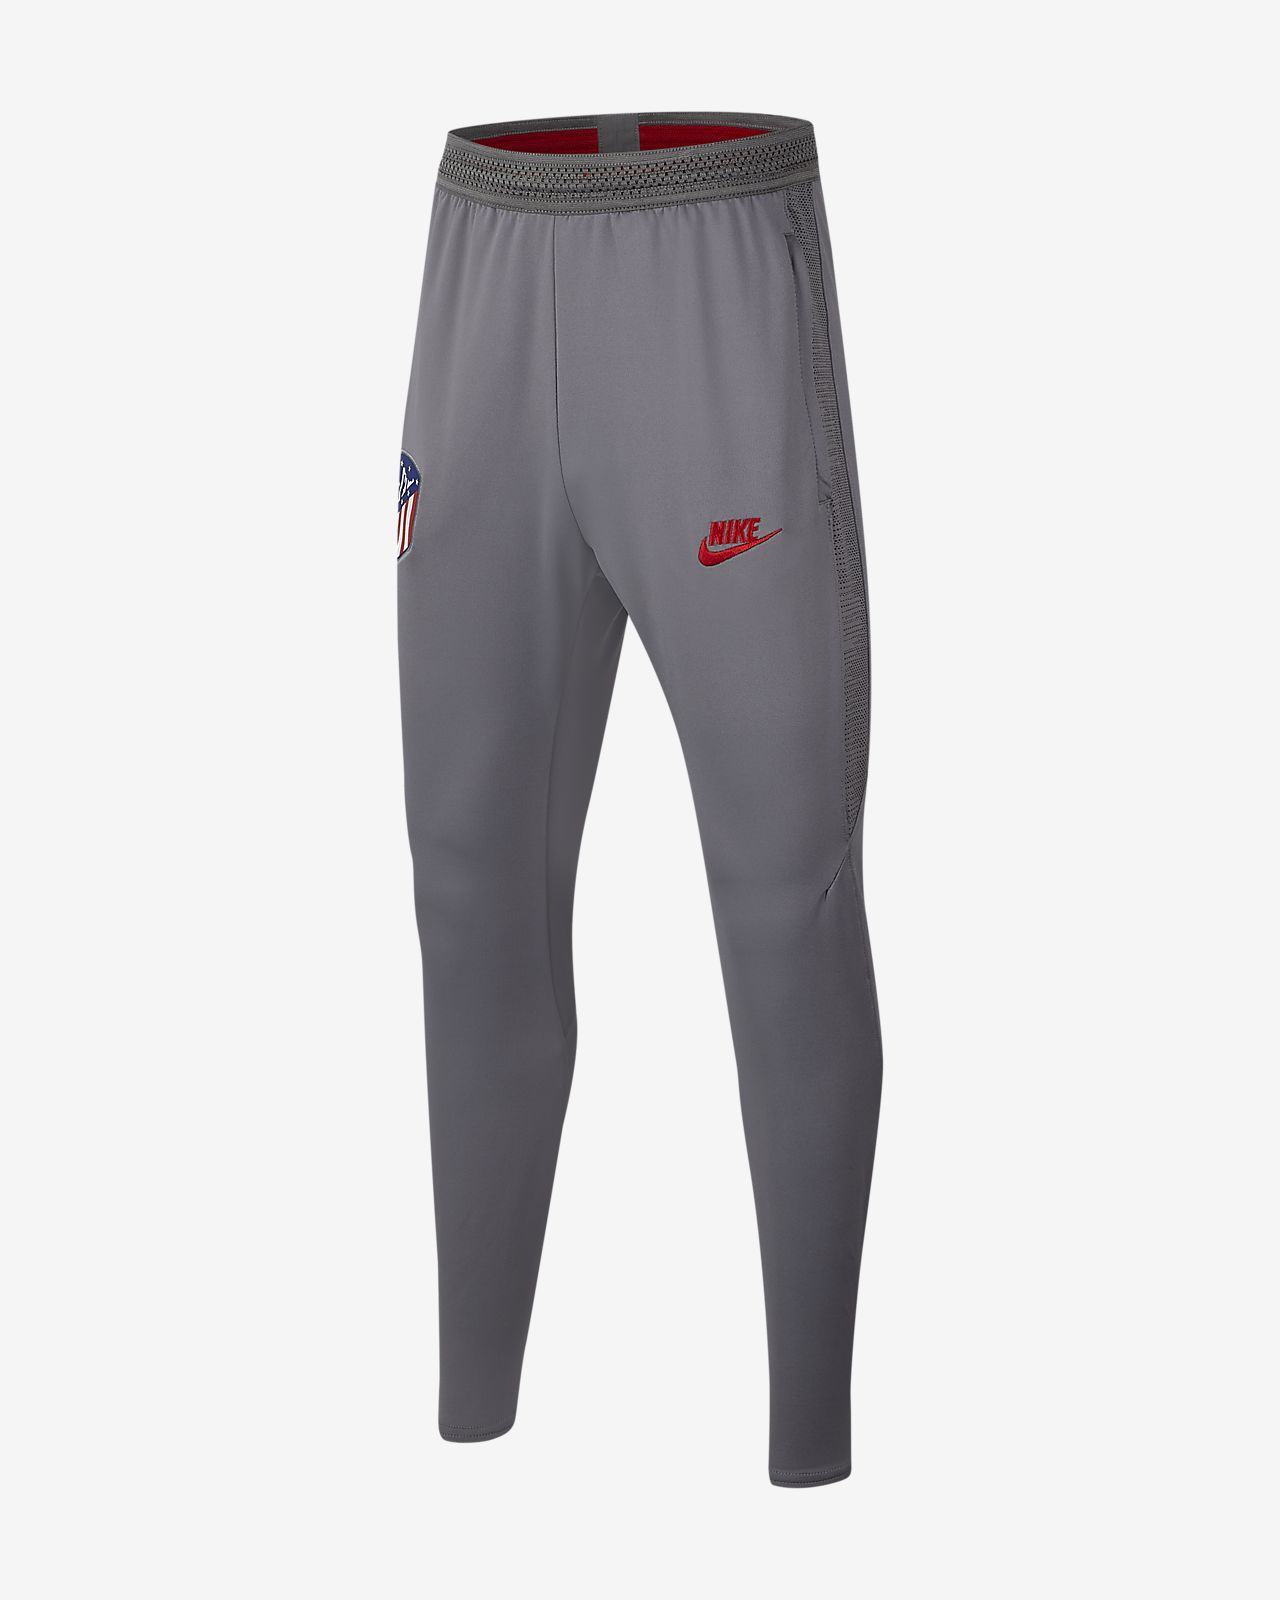 Nike Dri-FIT Atlético de Madrid Strike Older Kids' Football Pants